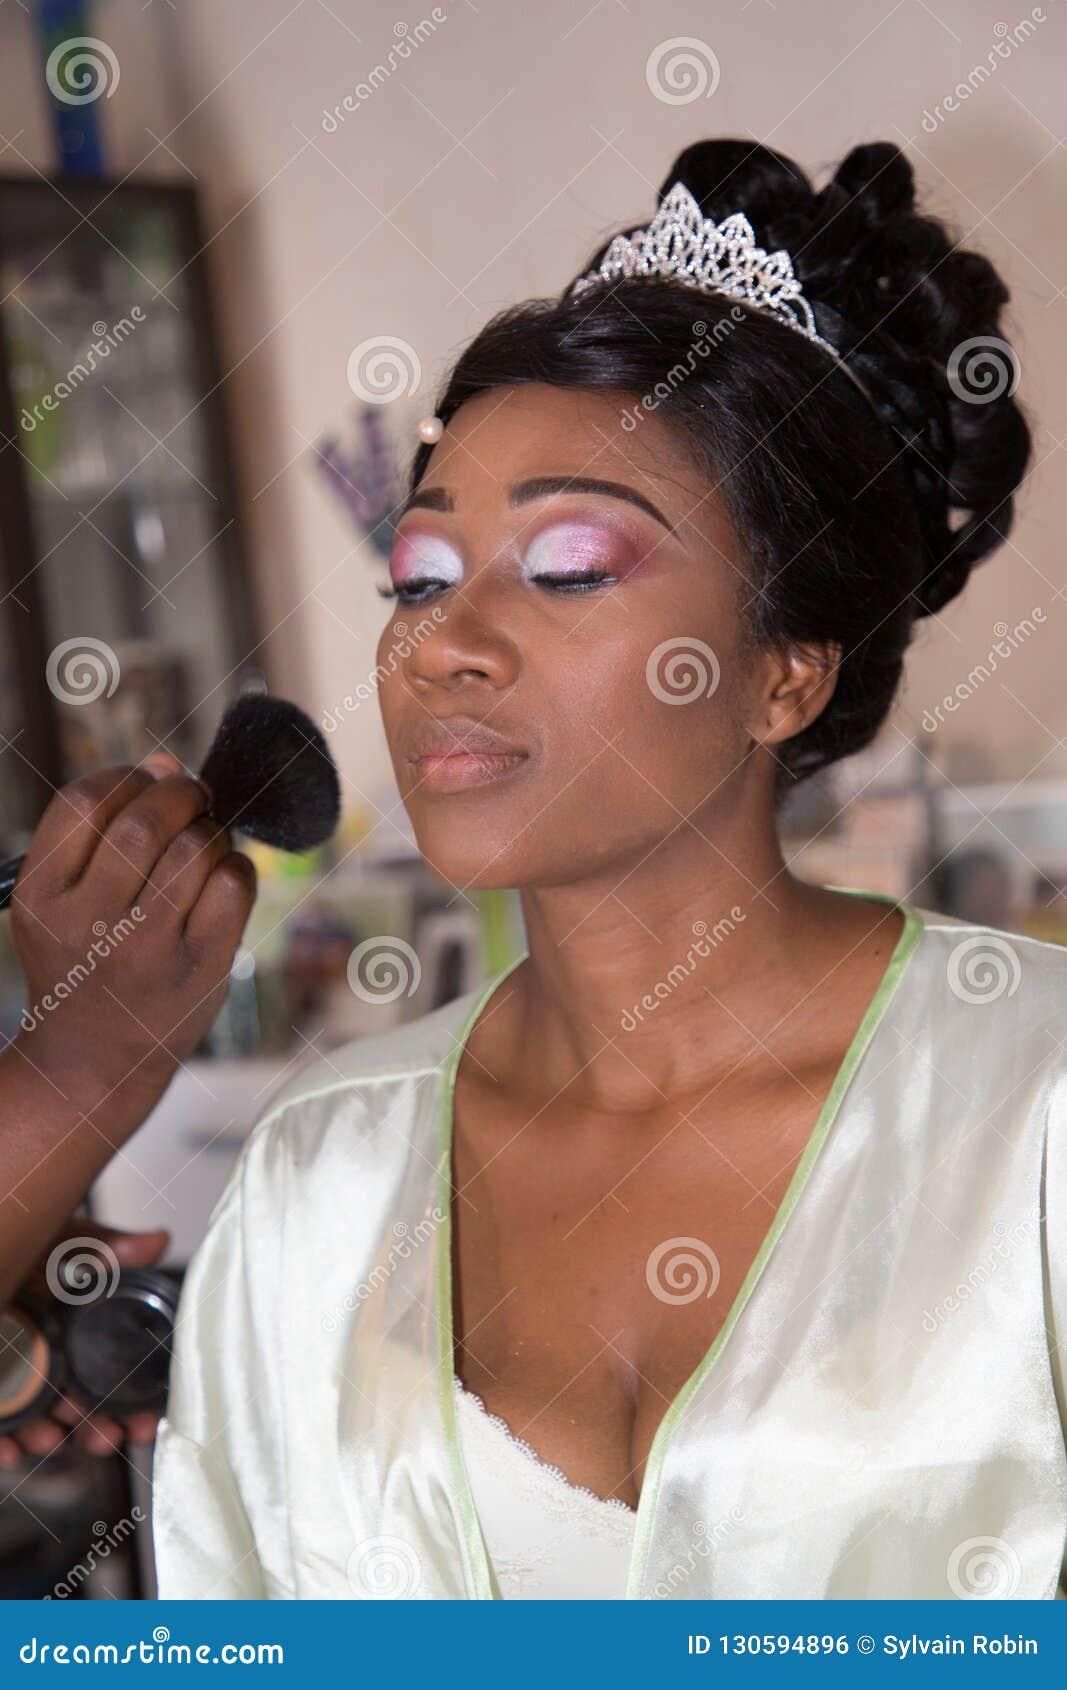 African American Wedding.Bride Applying Wedding Make Up For Black Skin African American